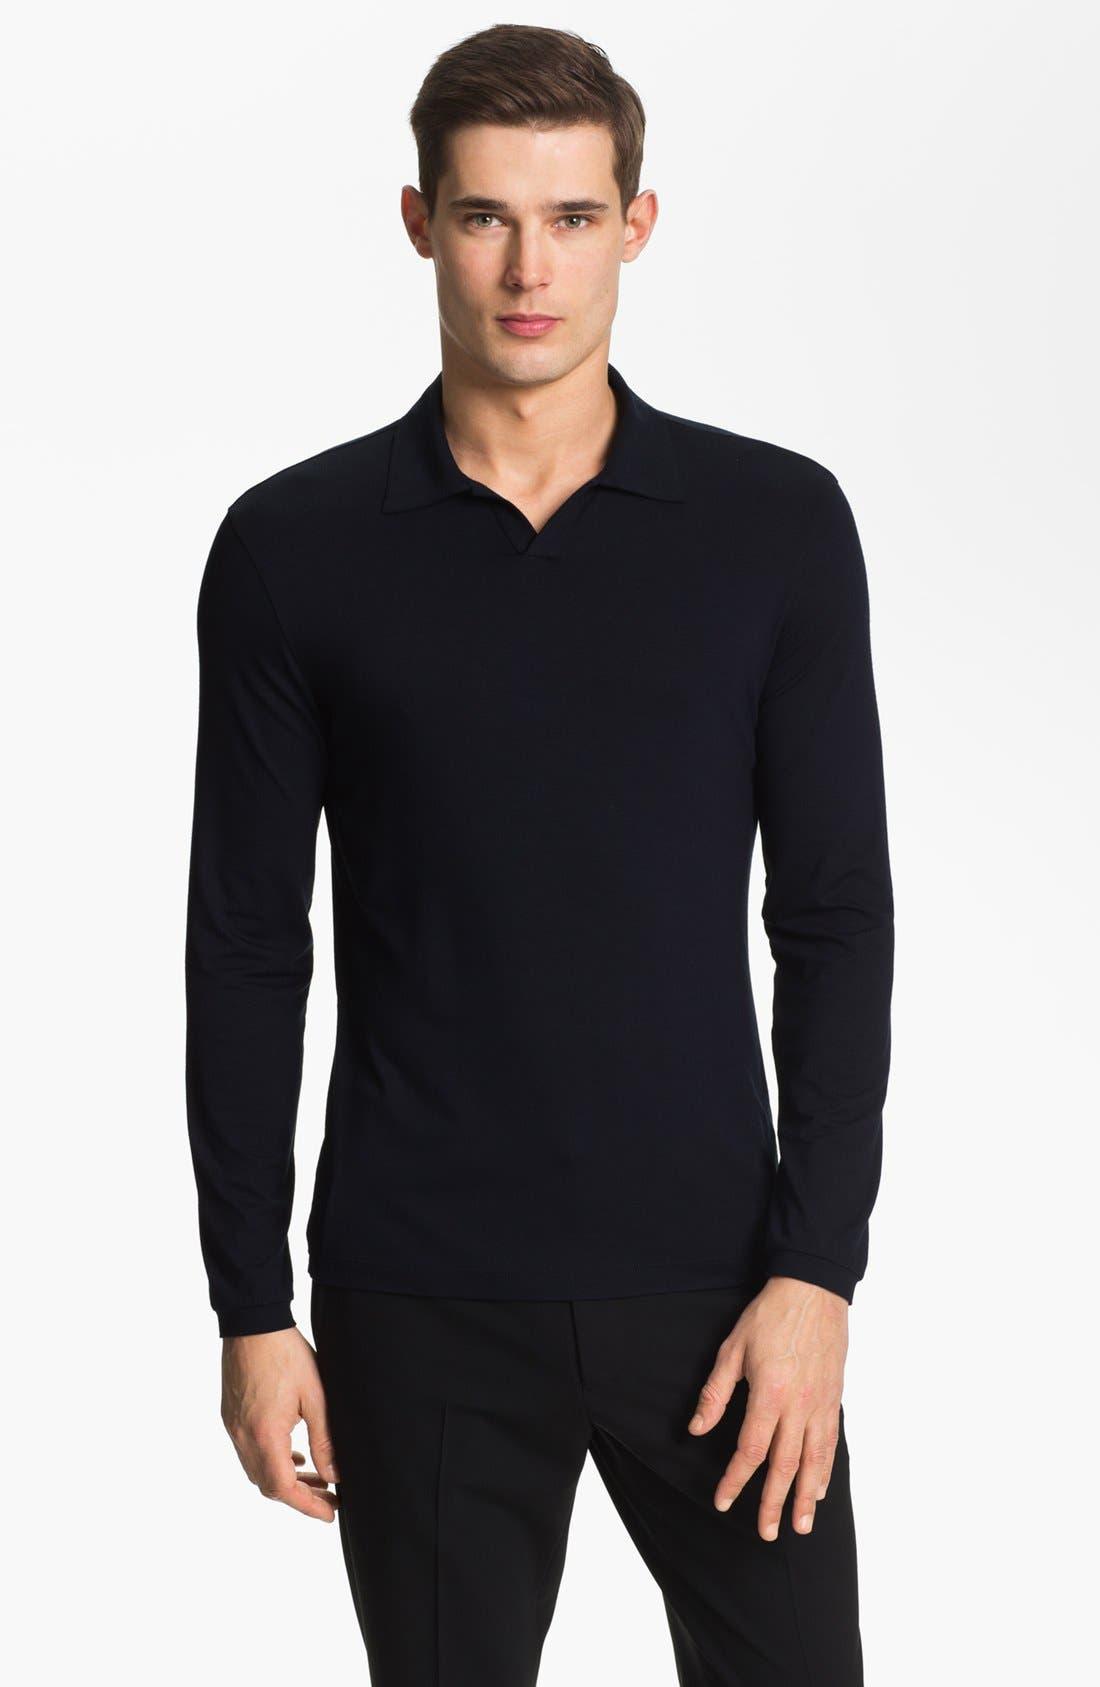 Alternate Image 1 Selected - Armani Collezioni Johnny Collar Knit Sweater